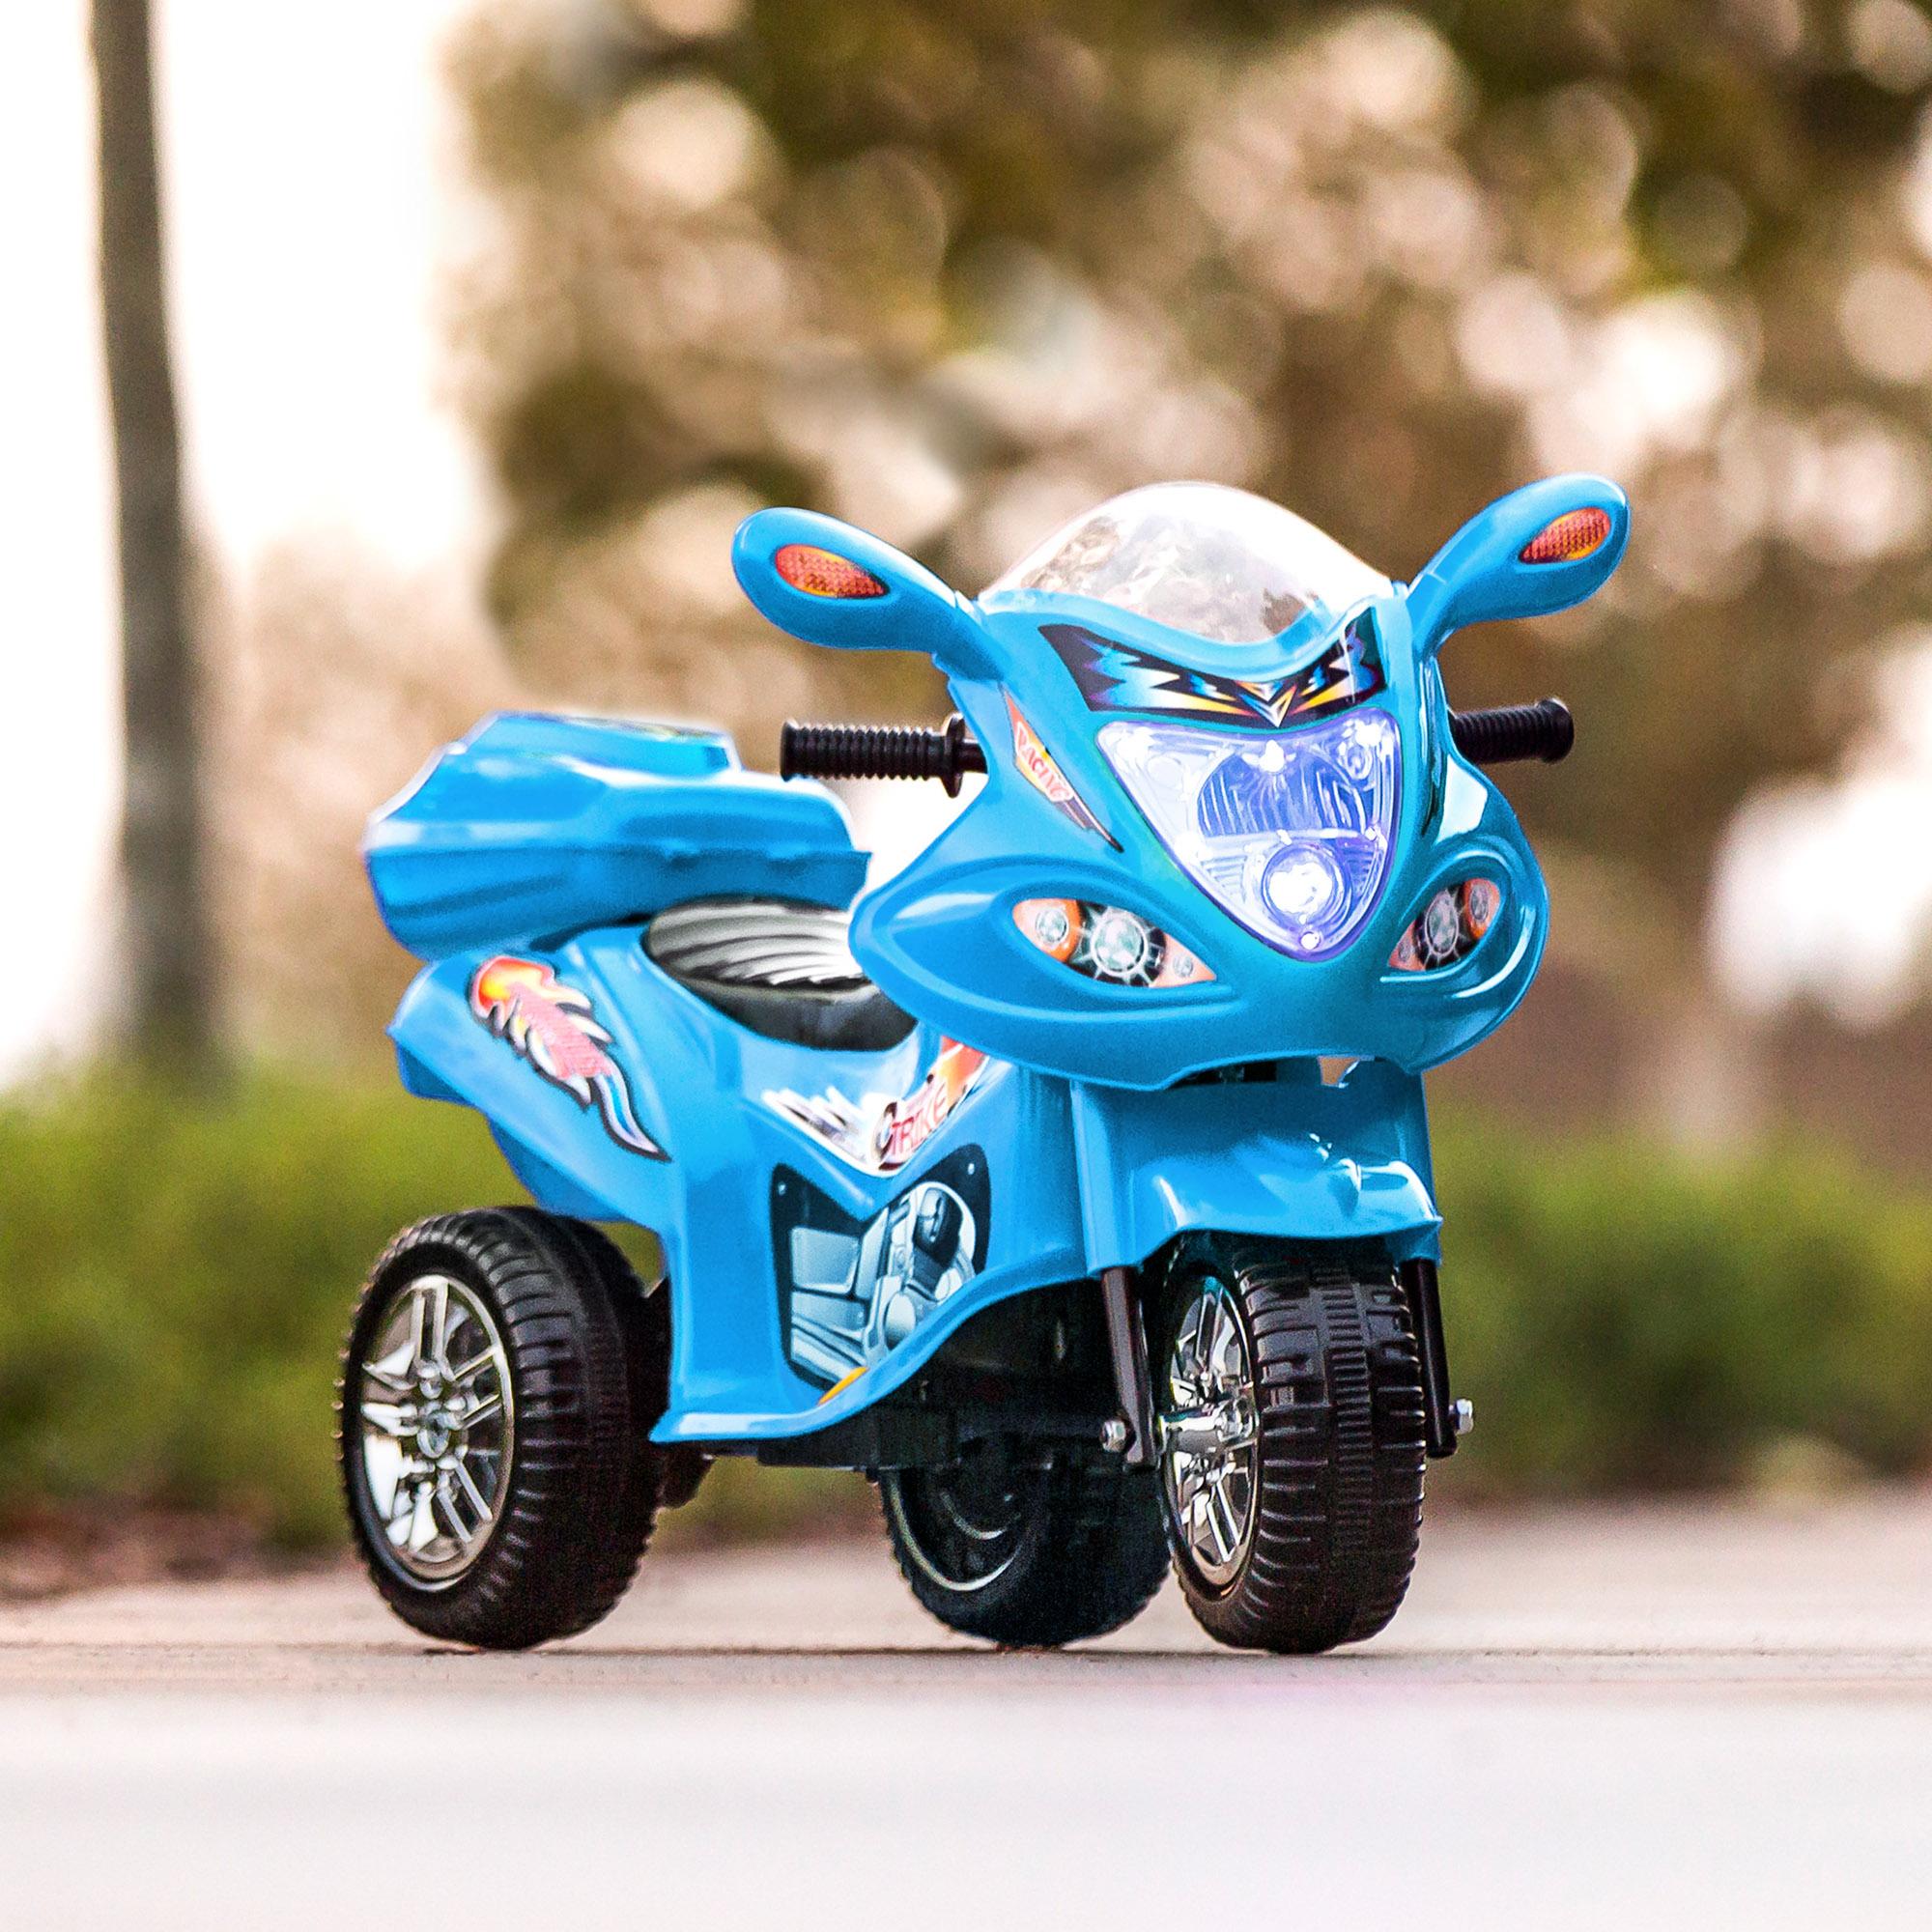 BCP-6V-Kids-3-Wheel-Motorcycle-Ride-On-Toy-w-LED-Lights-Music-Storage thumbnail 14